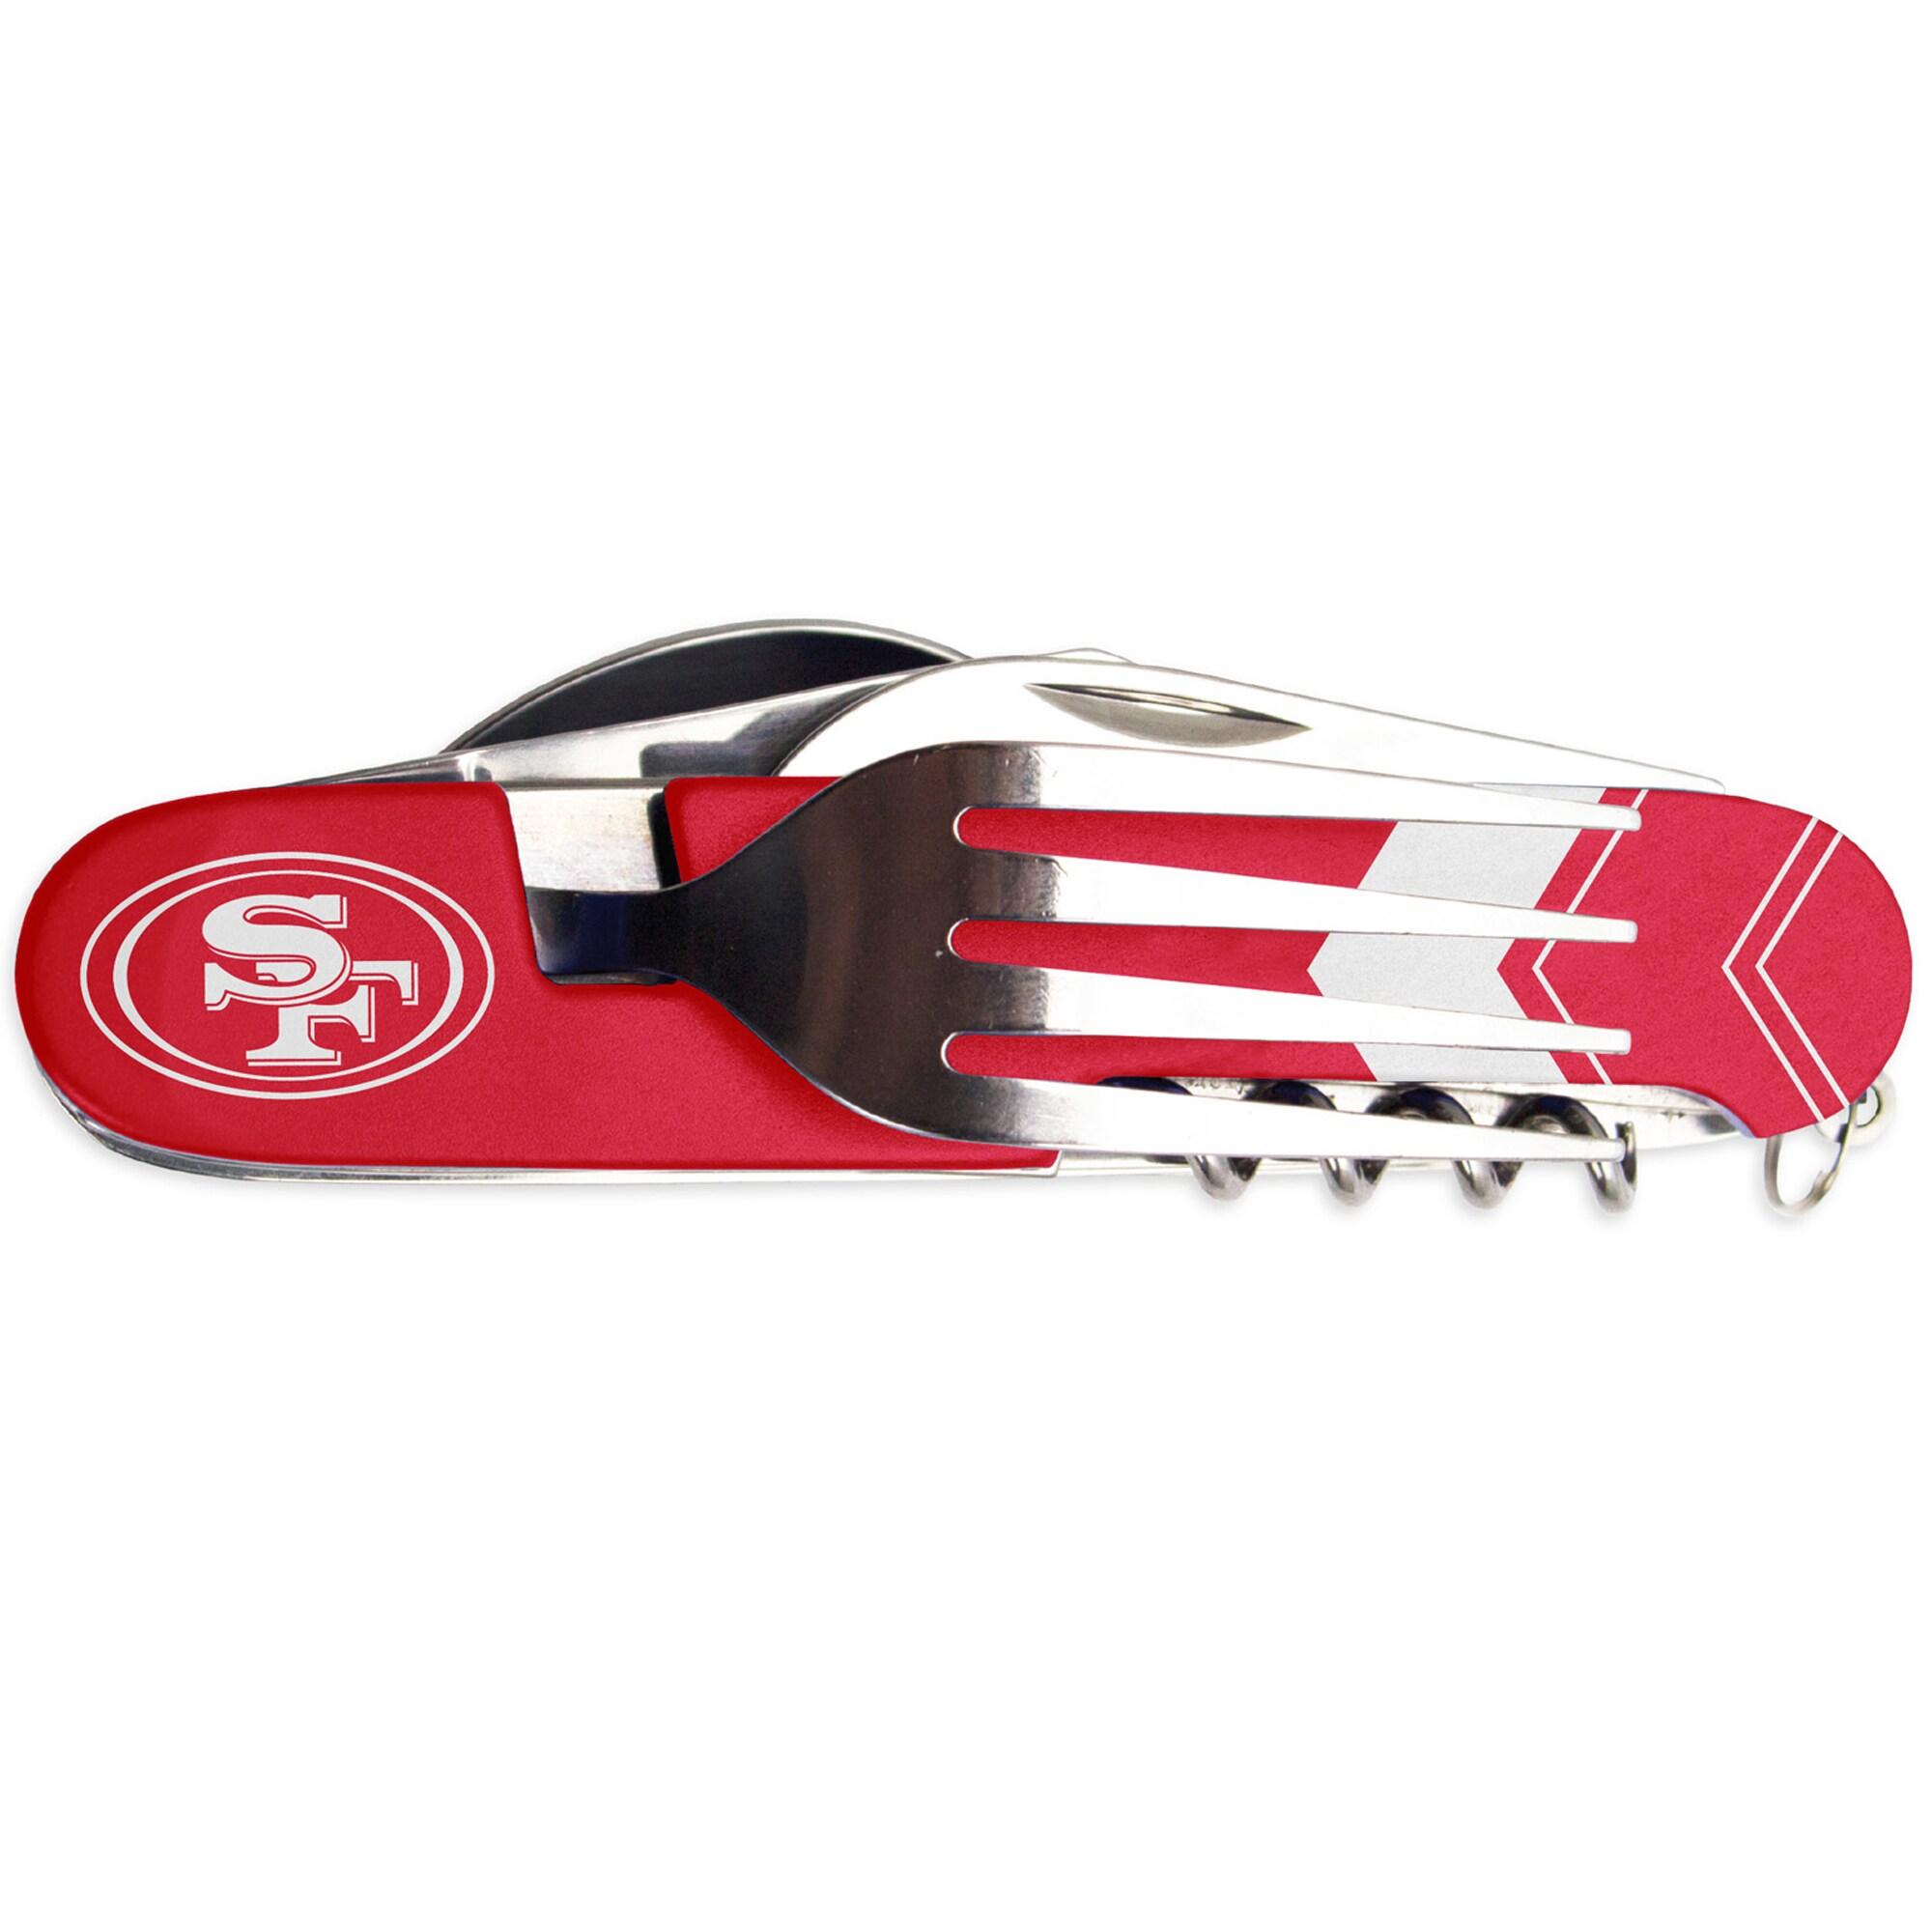 San Francisco 49ers Utensil Multi-Tool - Red